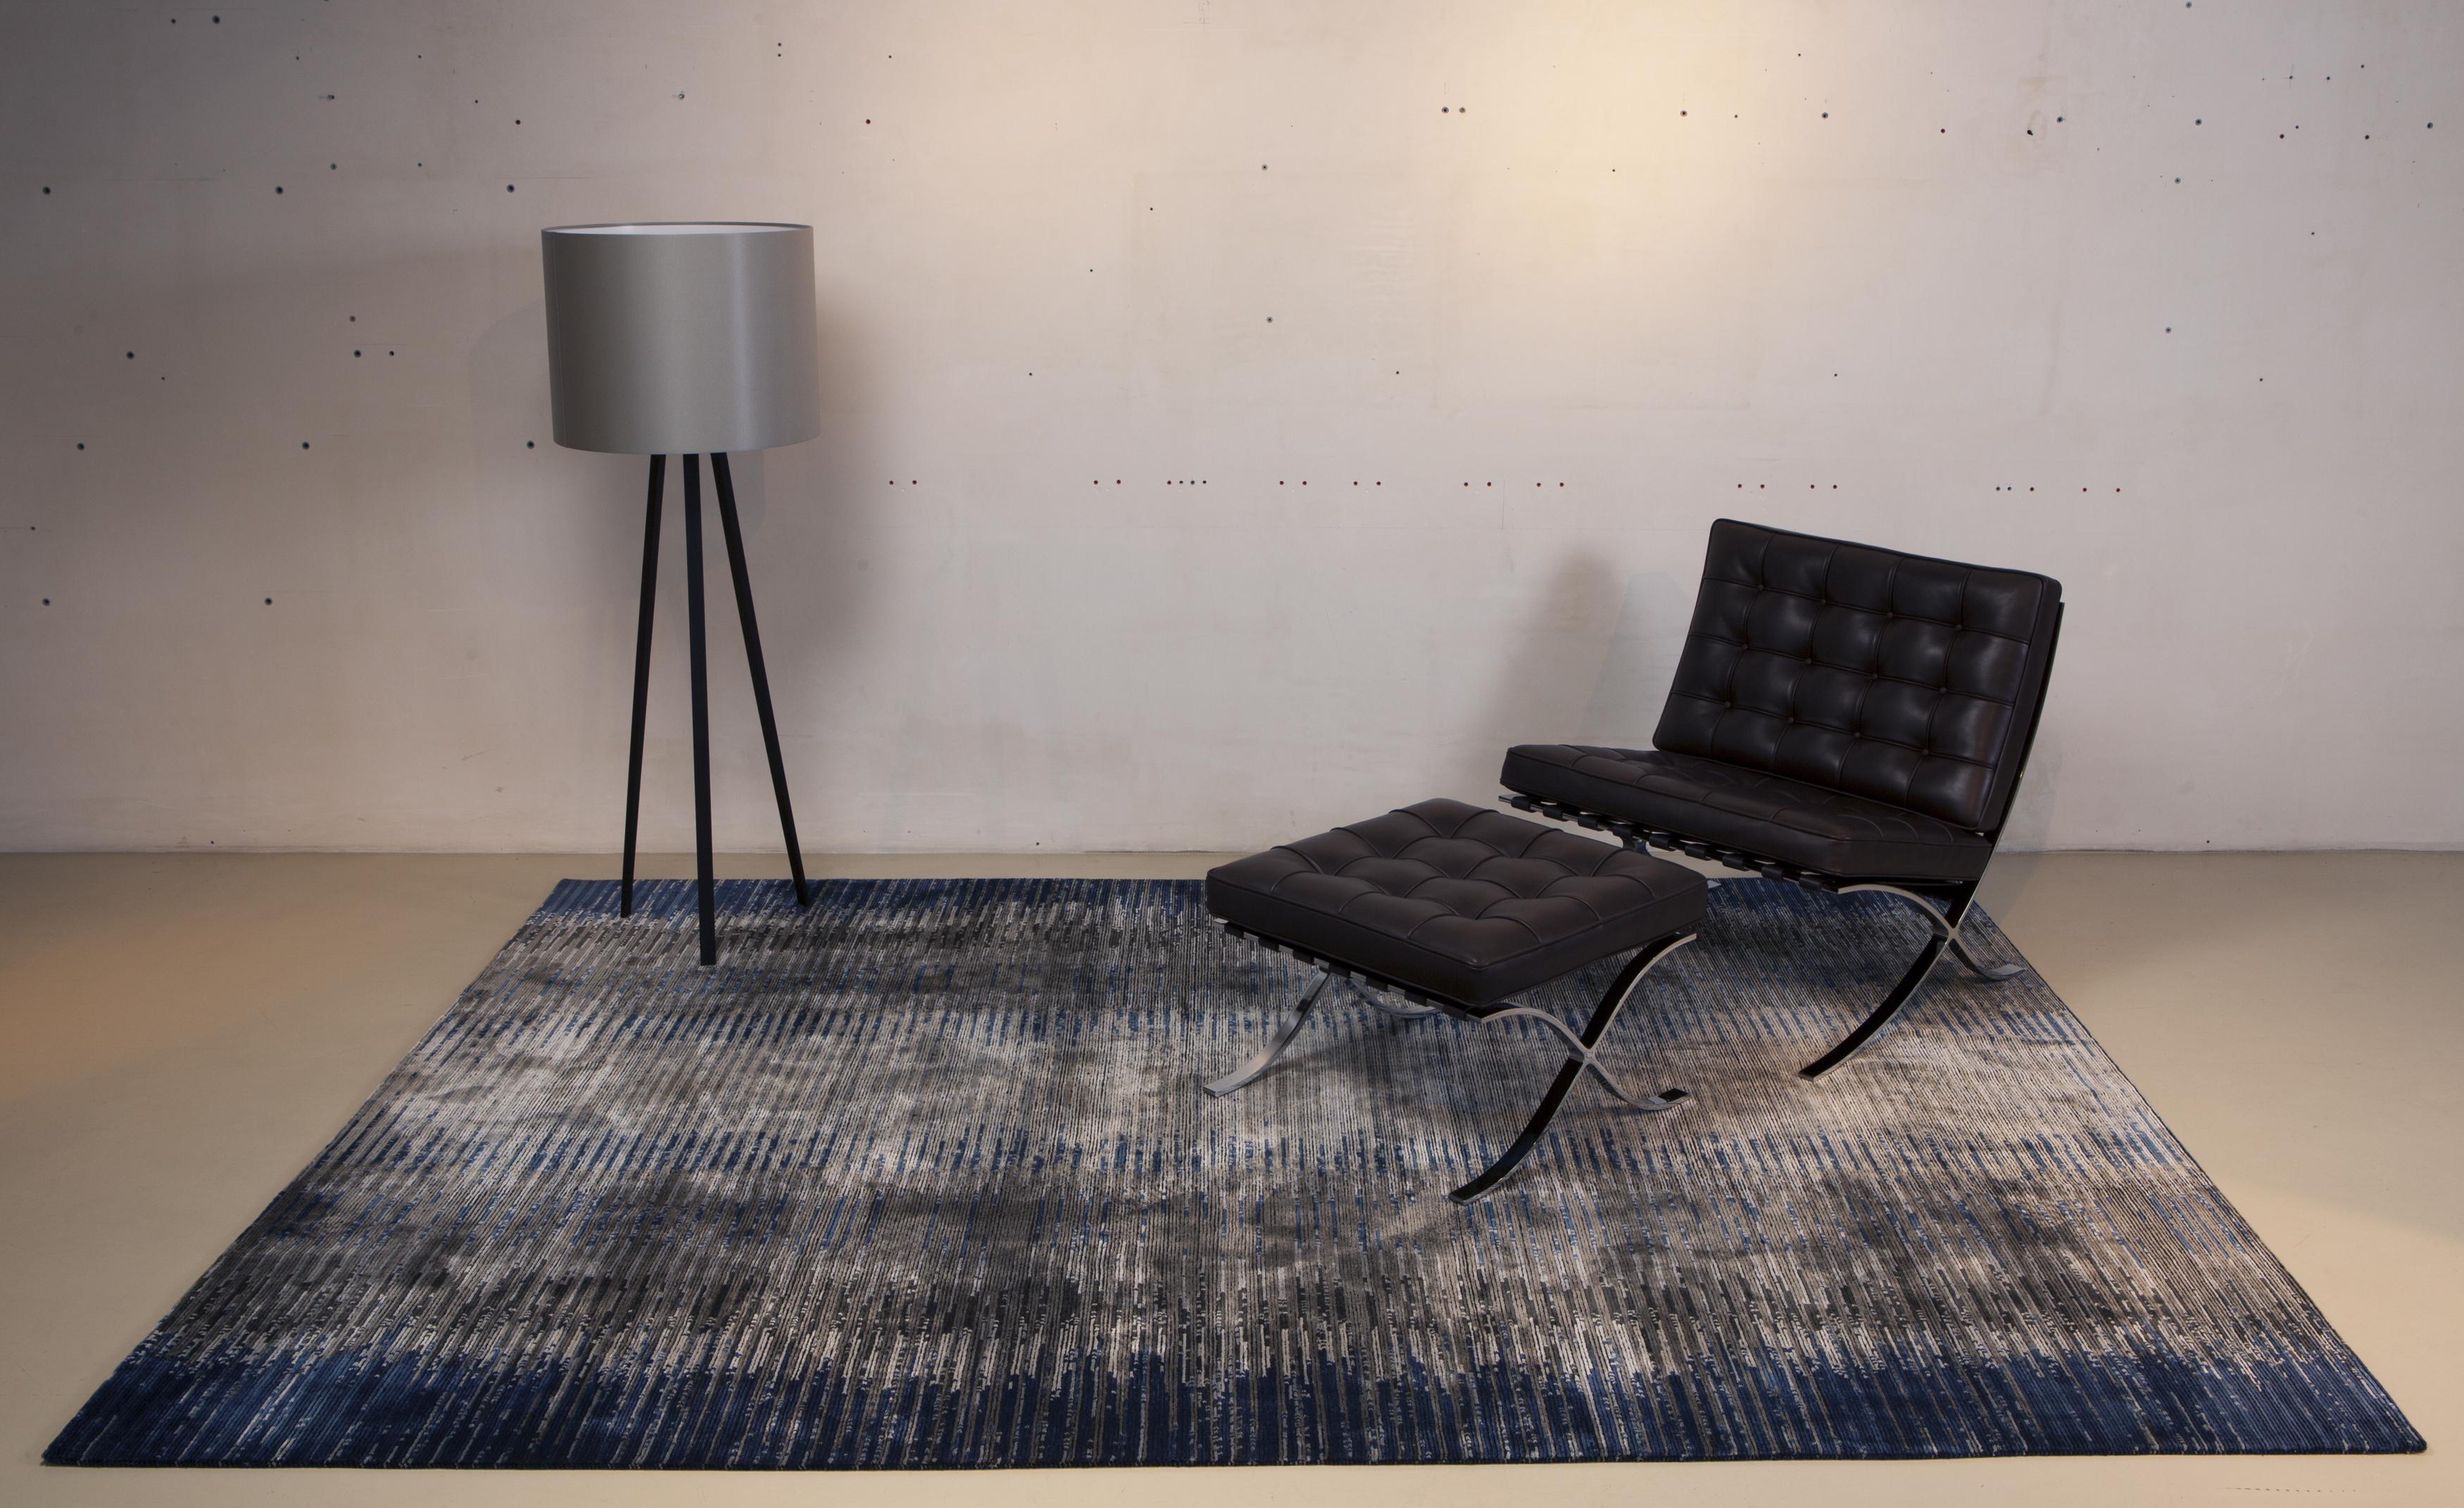 mamlin ma01 mischioff ag. Black Bedroom Furniture Sets. Home Design Ideas